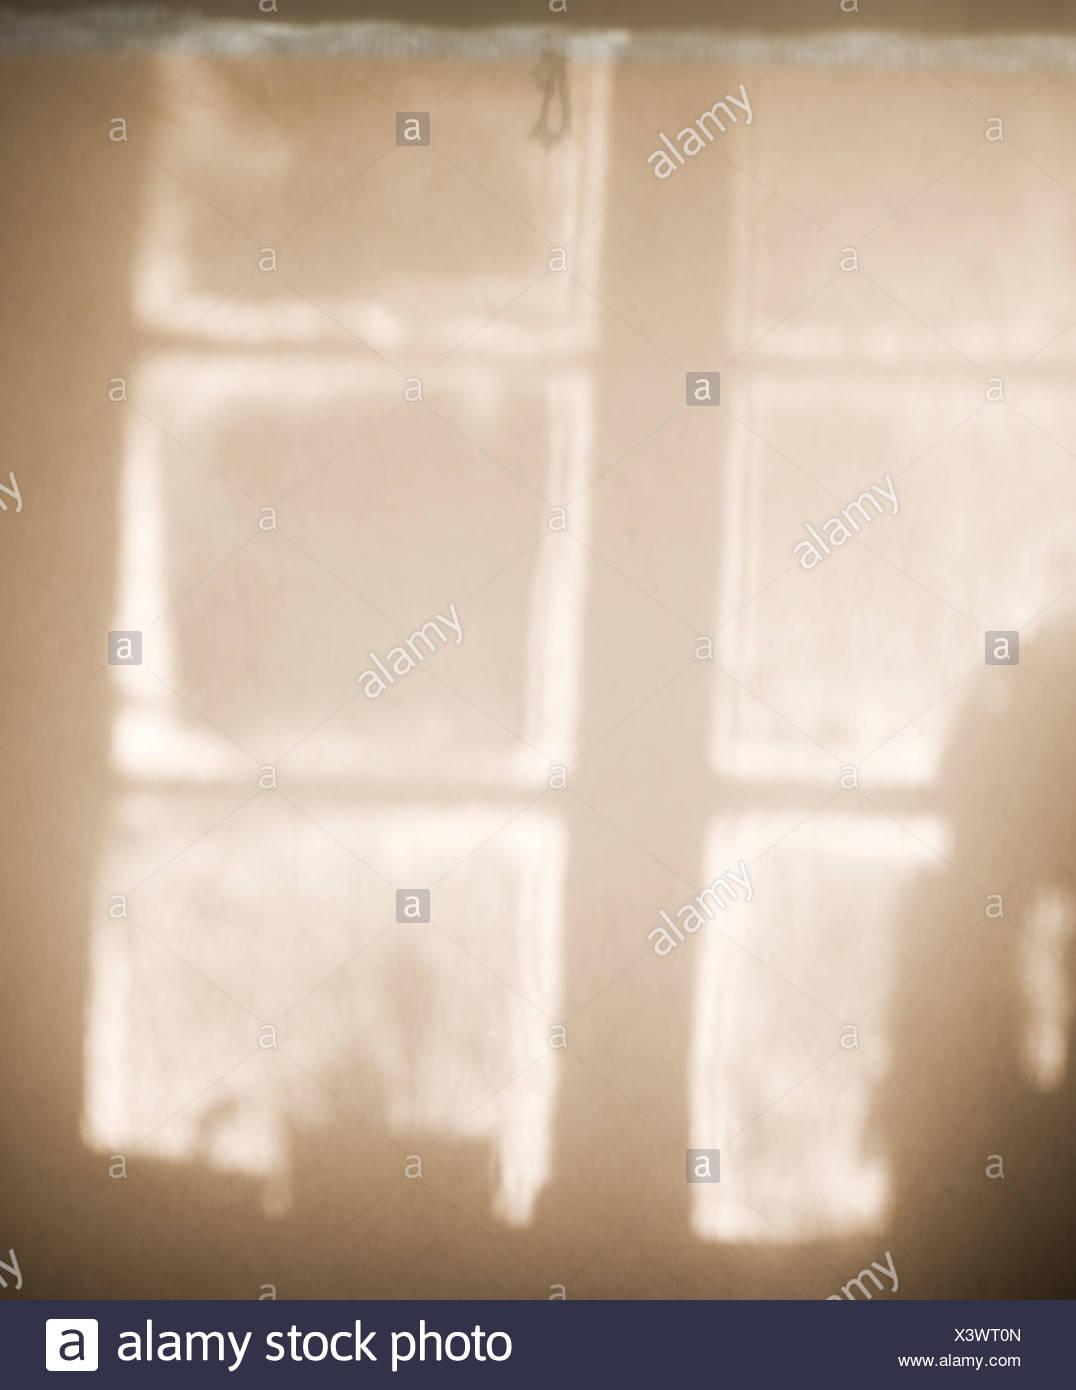 Scandinavian Peninsula, Sweden, Skane, View of window - Stock Image